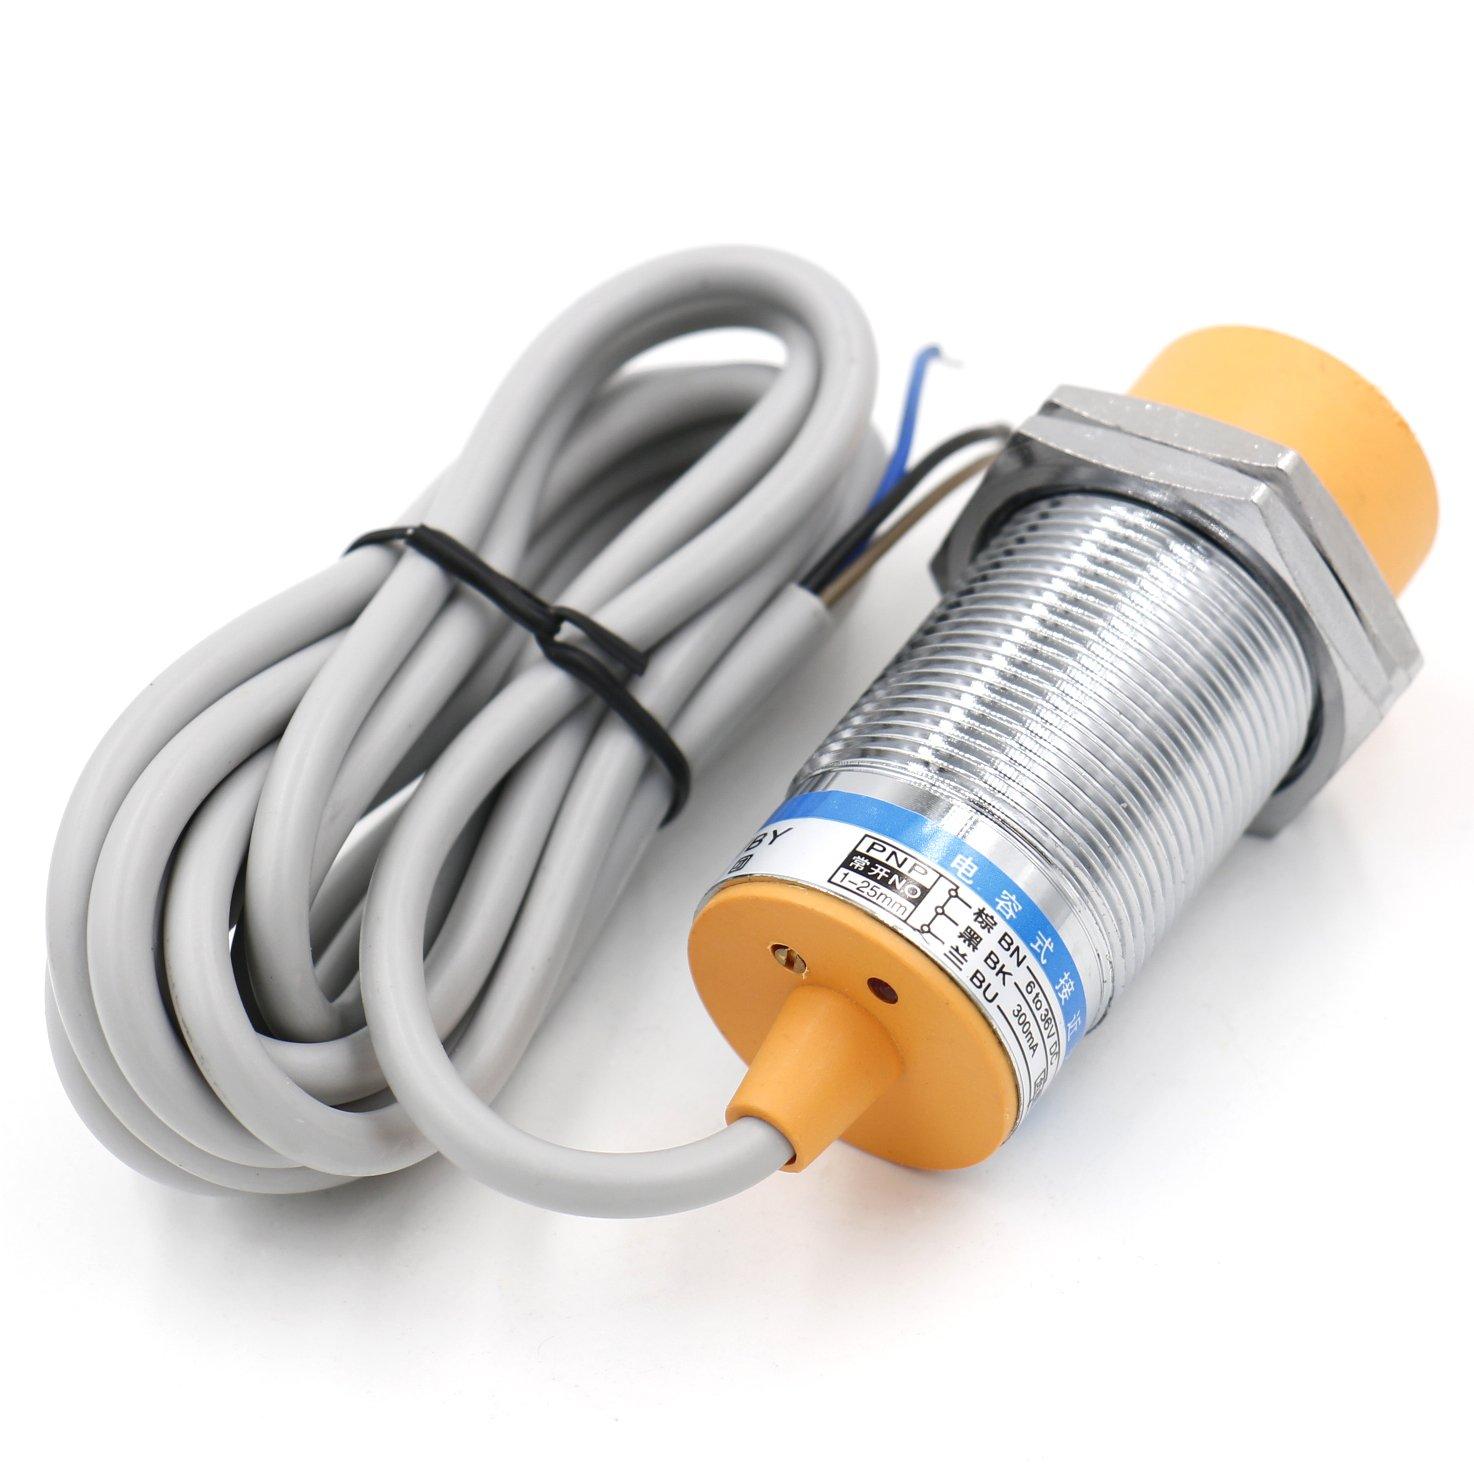 heschen capacitiva Sensor de proximidad Interruptor ljc30 a3-h-z/por detector 1 - 25 mm 6 - 36 VDC 300 mA PNP NO Normalmente Abierto (alambre de) 3: ...